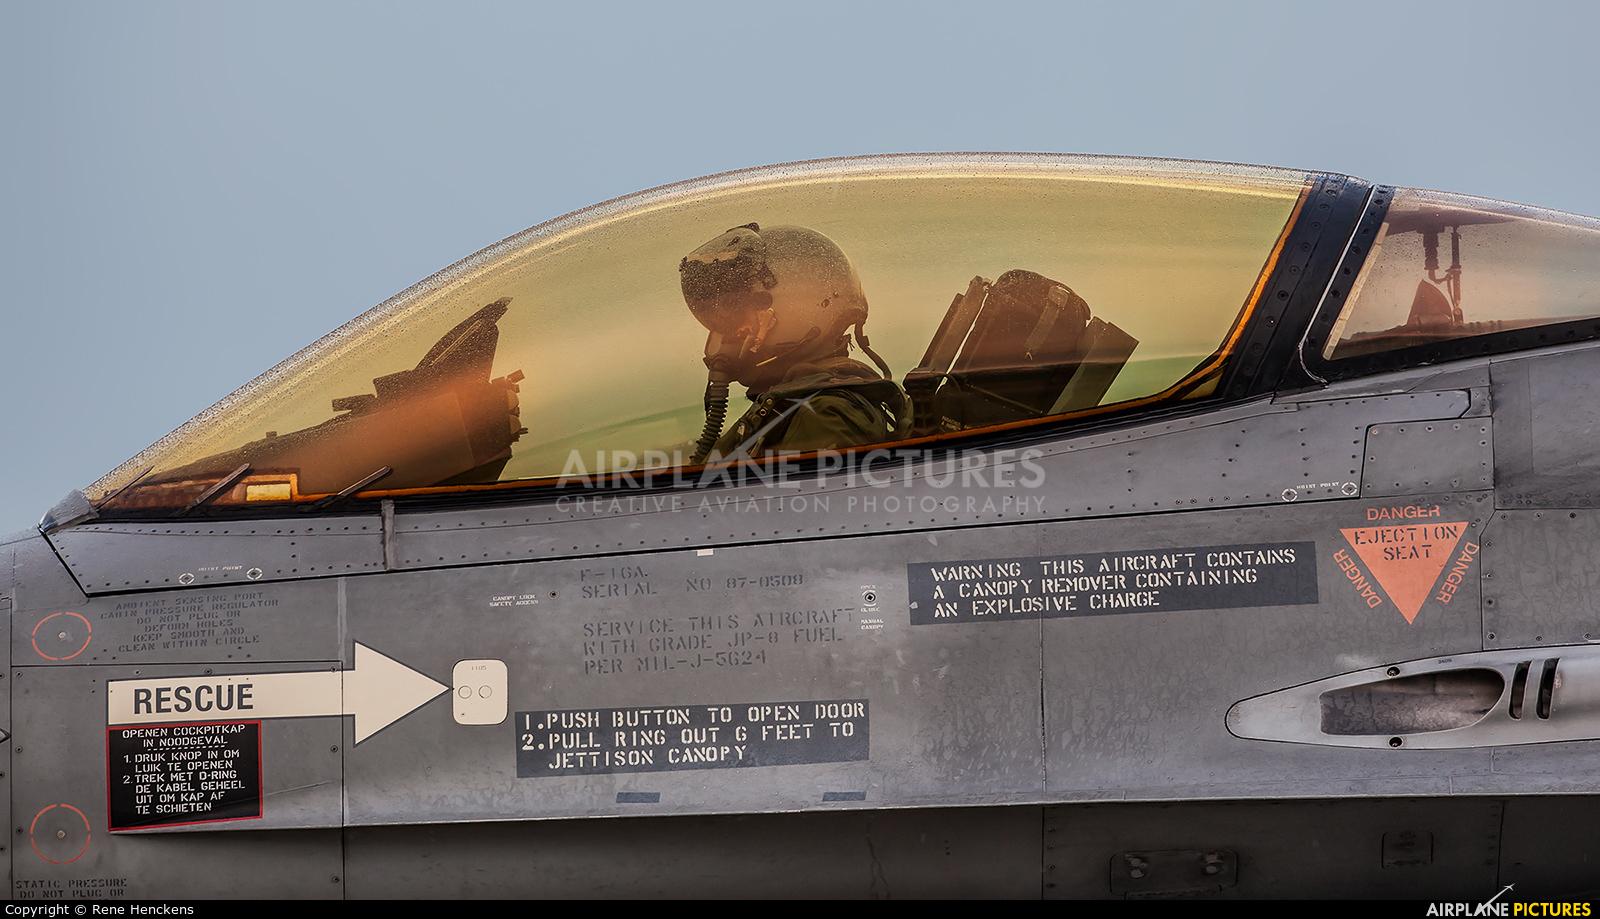 J-508 - Netherlands - Air Force General Dynamics F-16A